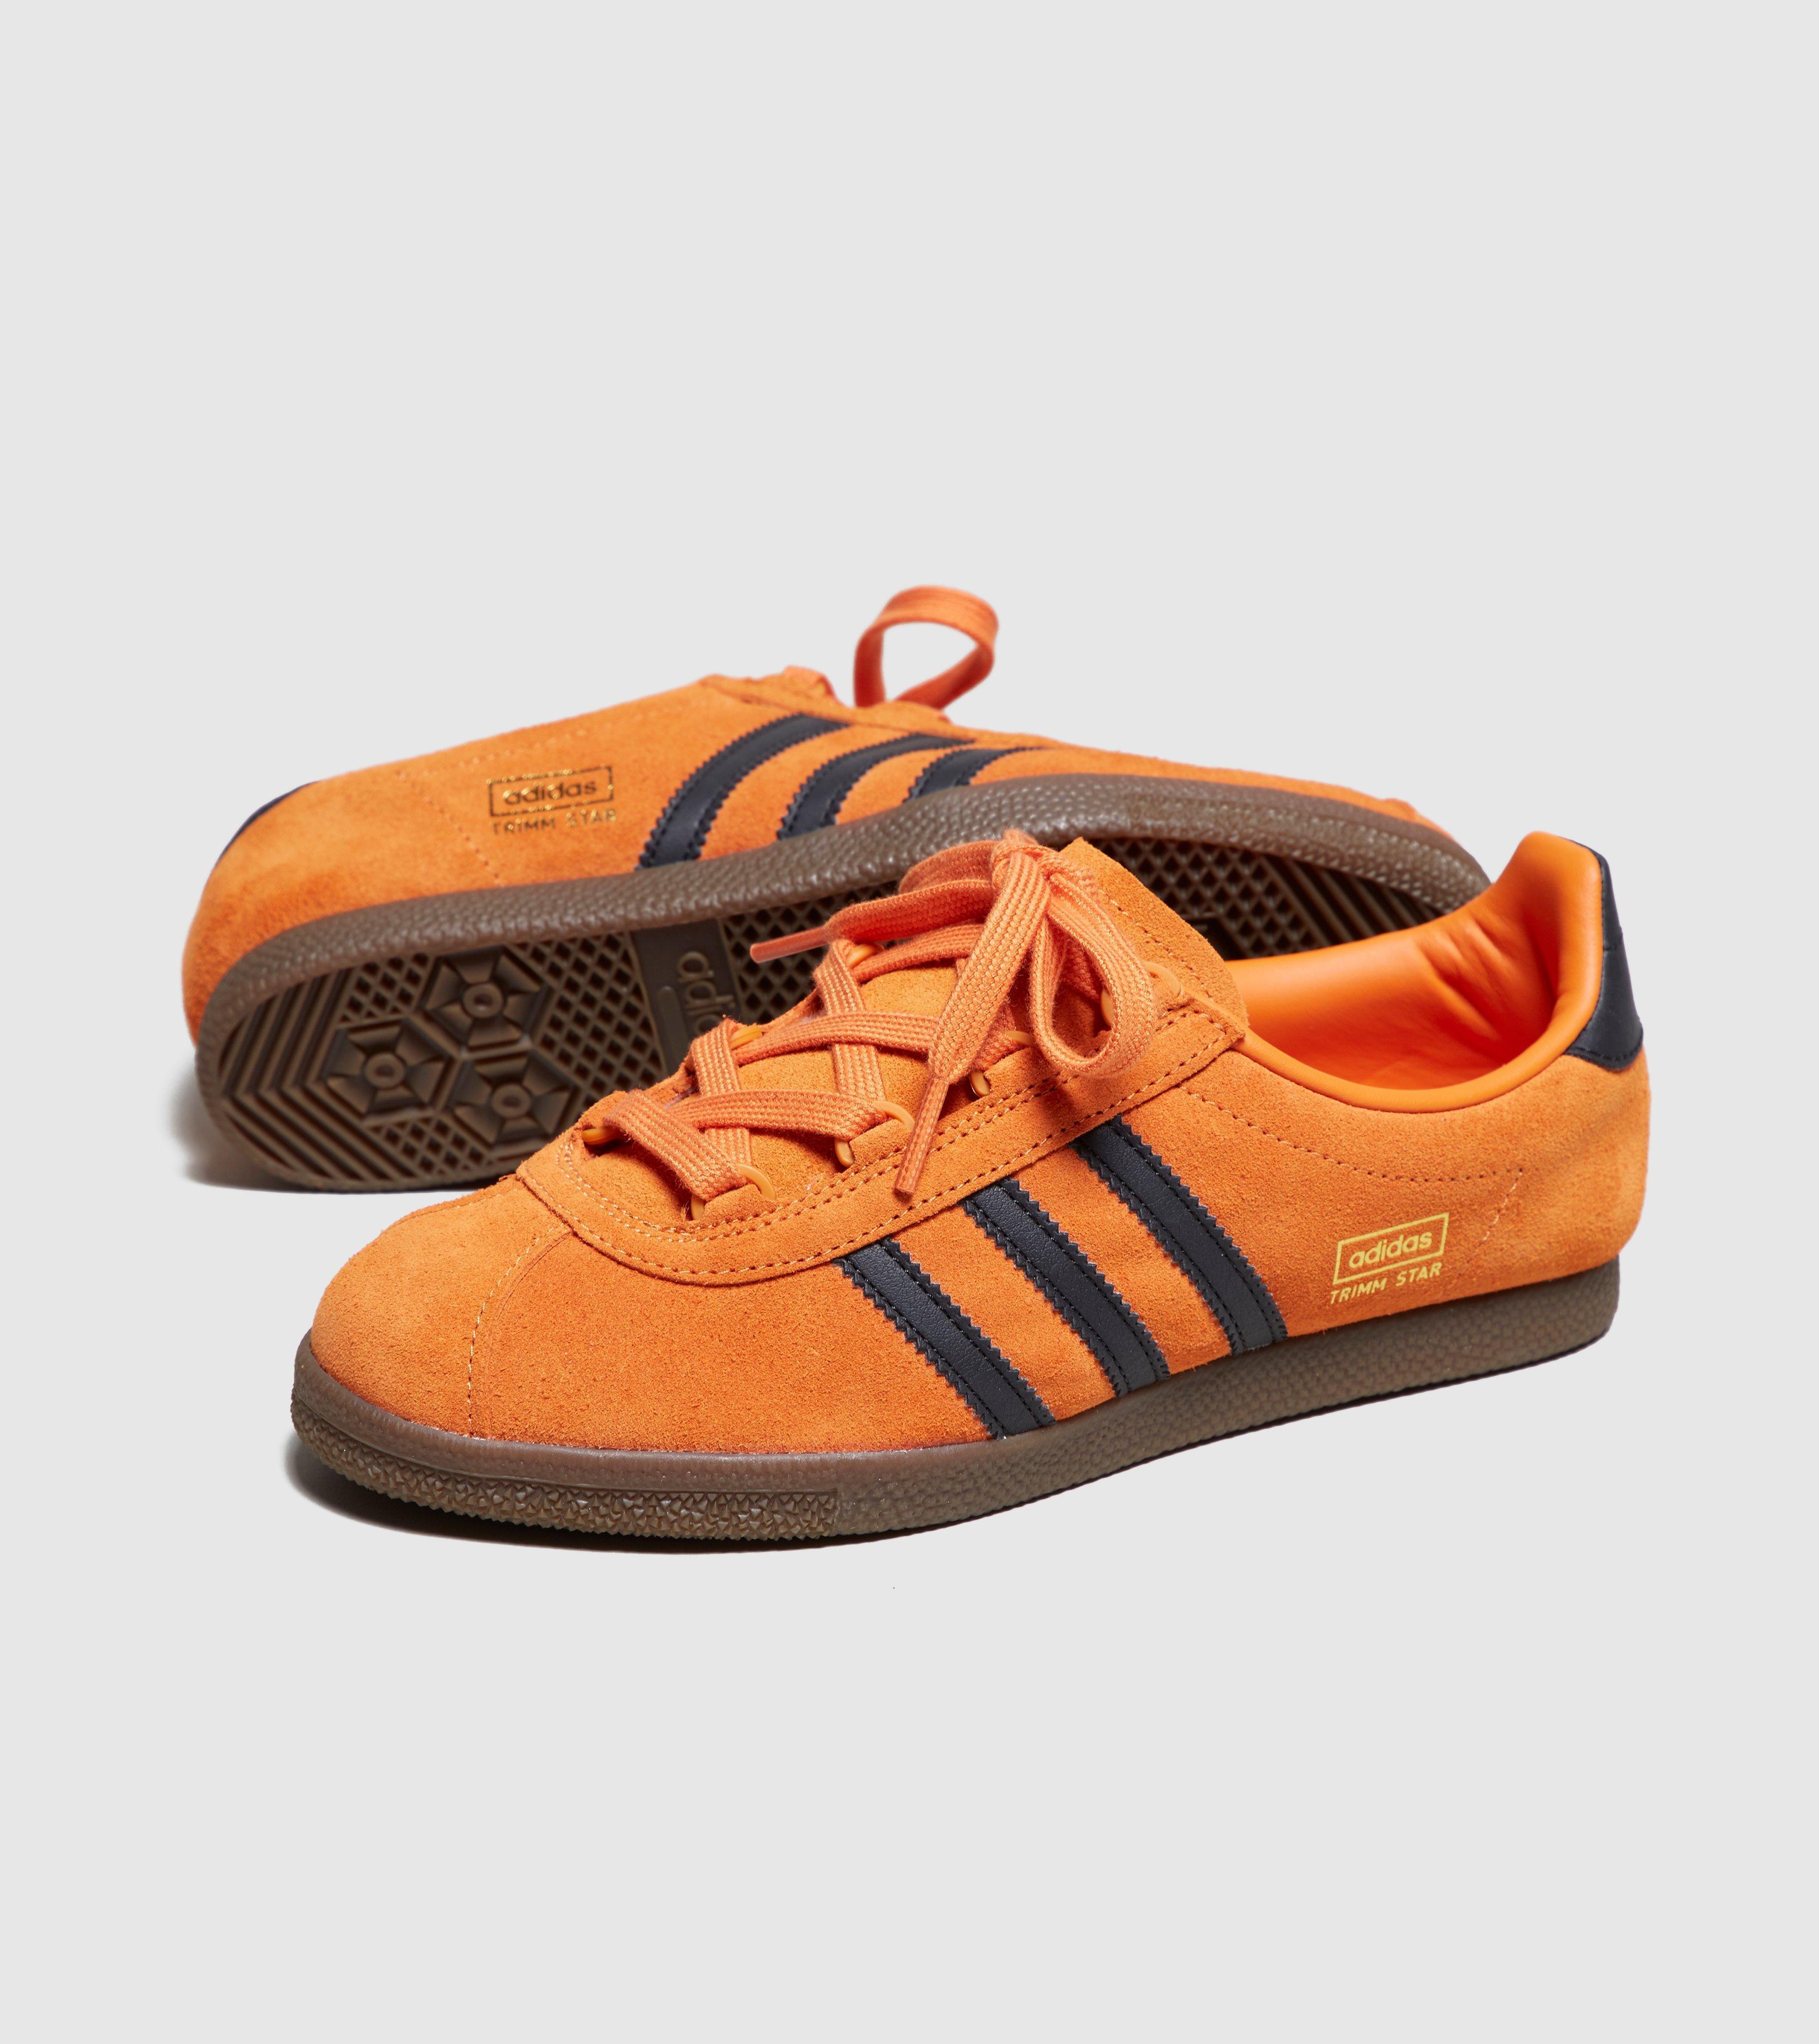 70cd1366cc17e adidas Originals Trimm Star Size? Exclusive Women's in Orange - Lyst